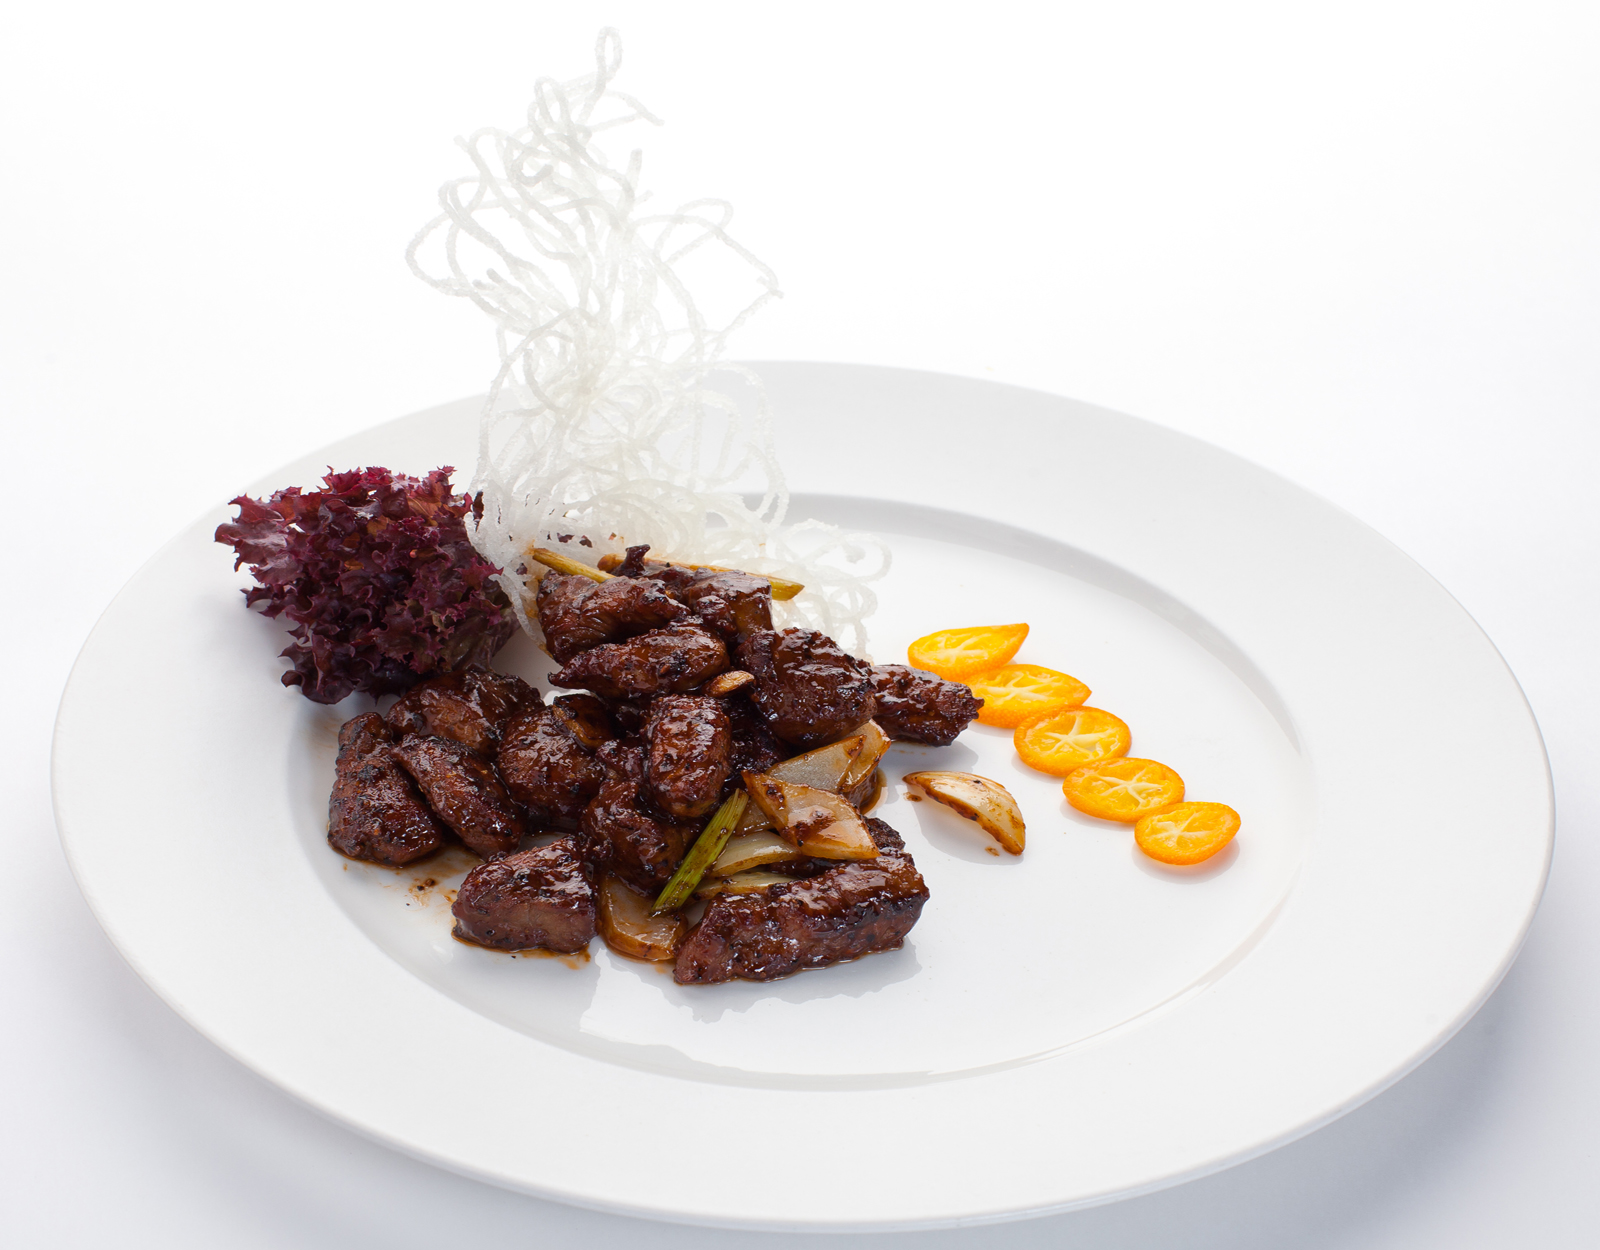 Говядина по-китайски в соусе из черного перца